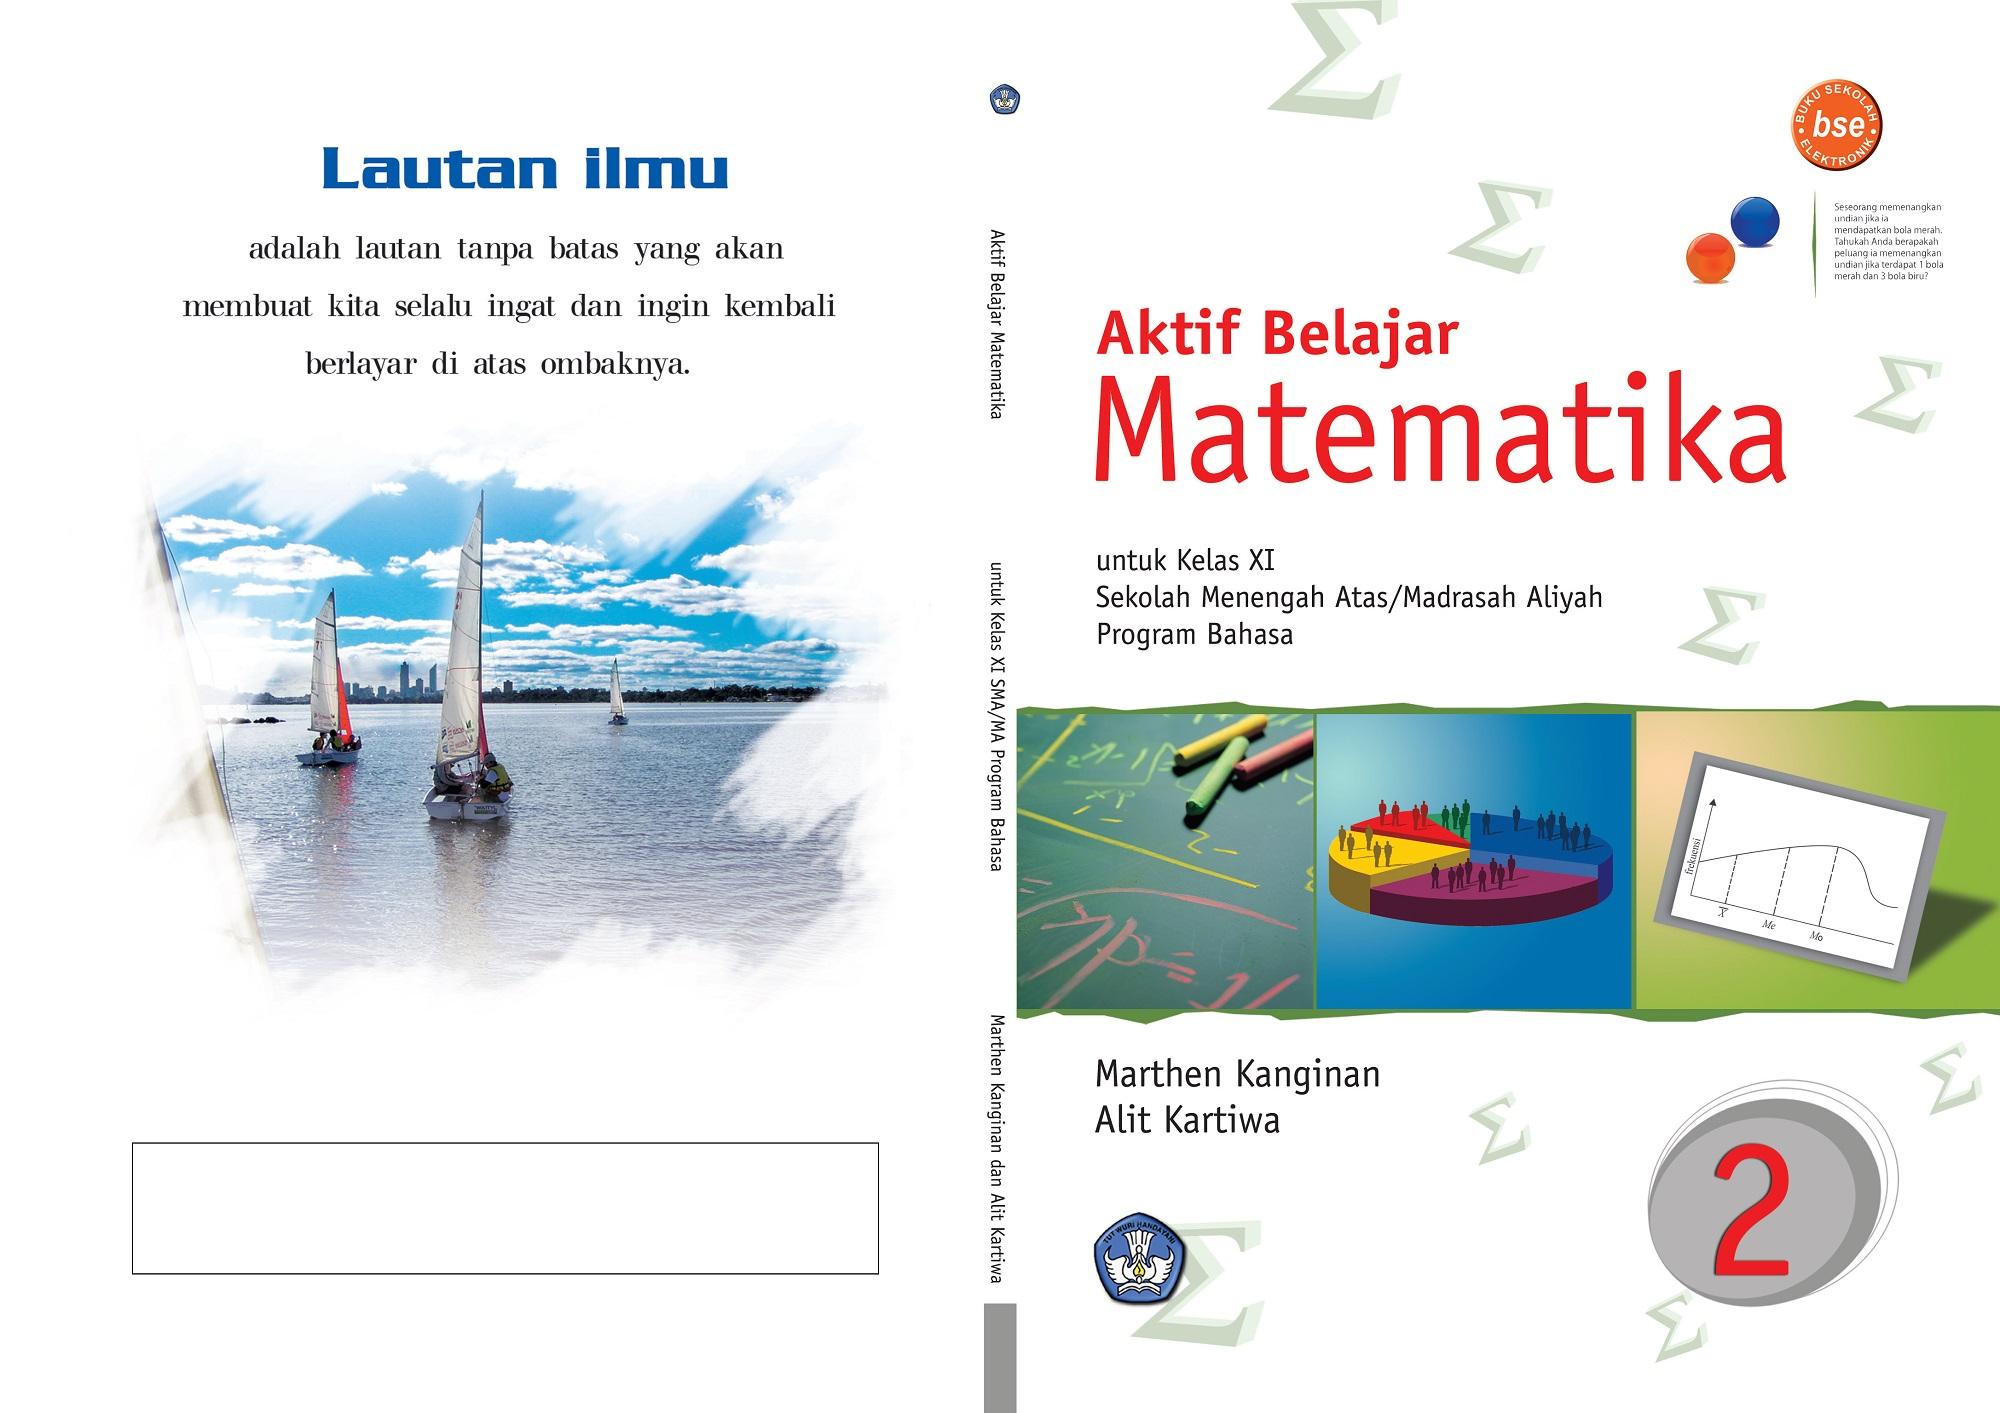 Download Buku Sekolah Elektronik (BSE) Mata Pelajaran Matematika SMA Kelas X, XI dan XII